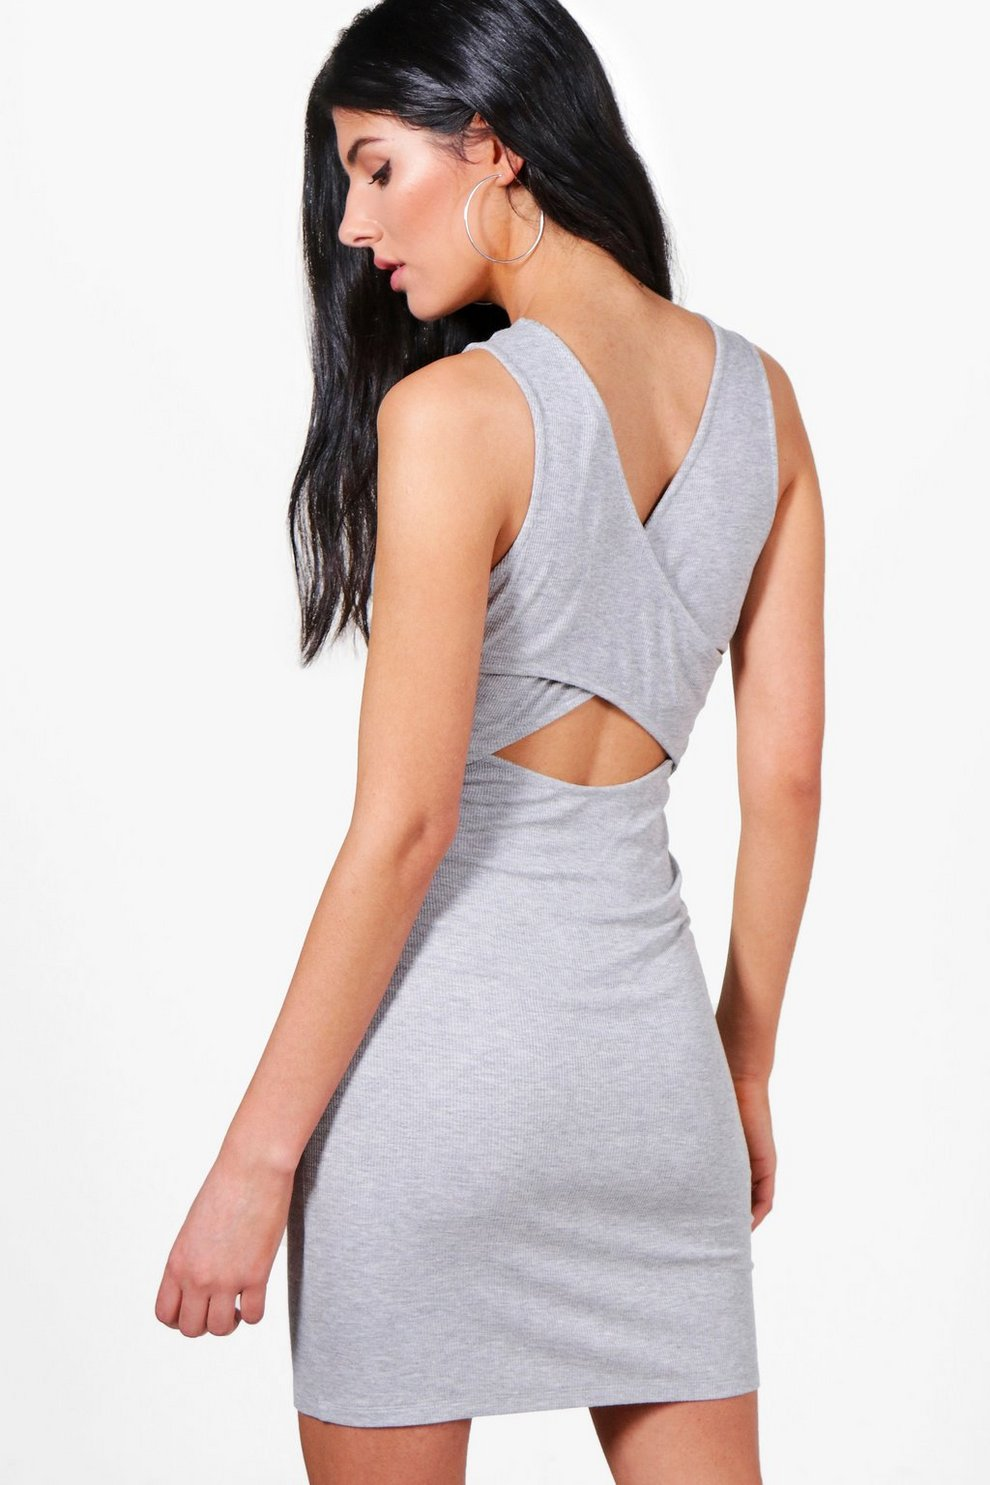 43f19e3208b4b Womens Grey marl Ella Cross Over Back Detail Bodycon Dress